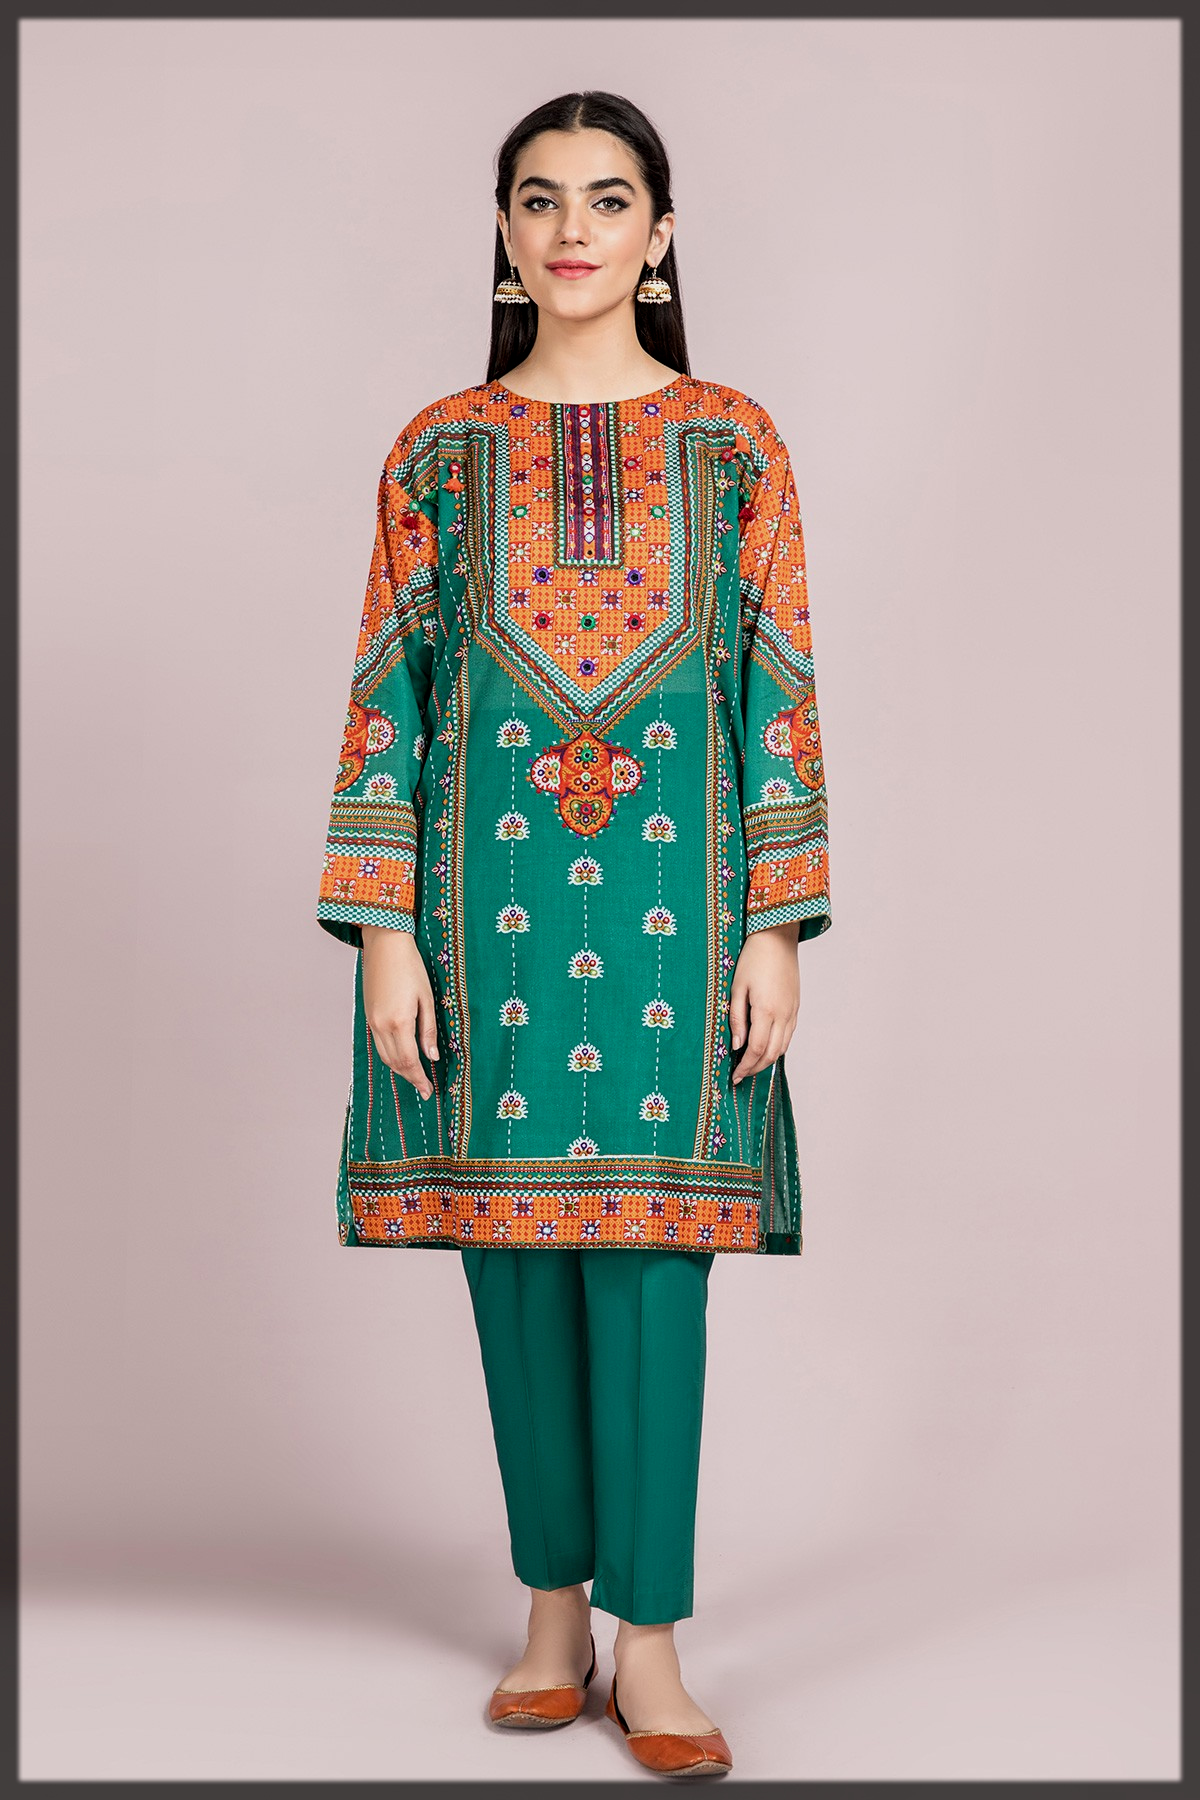 Sleek Green Traditional Theme Shirt for Young Girls